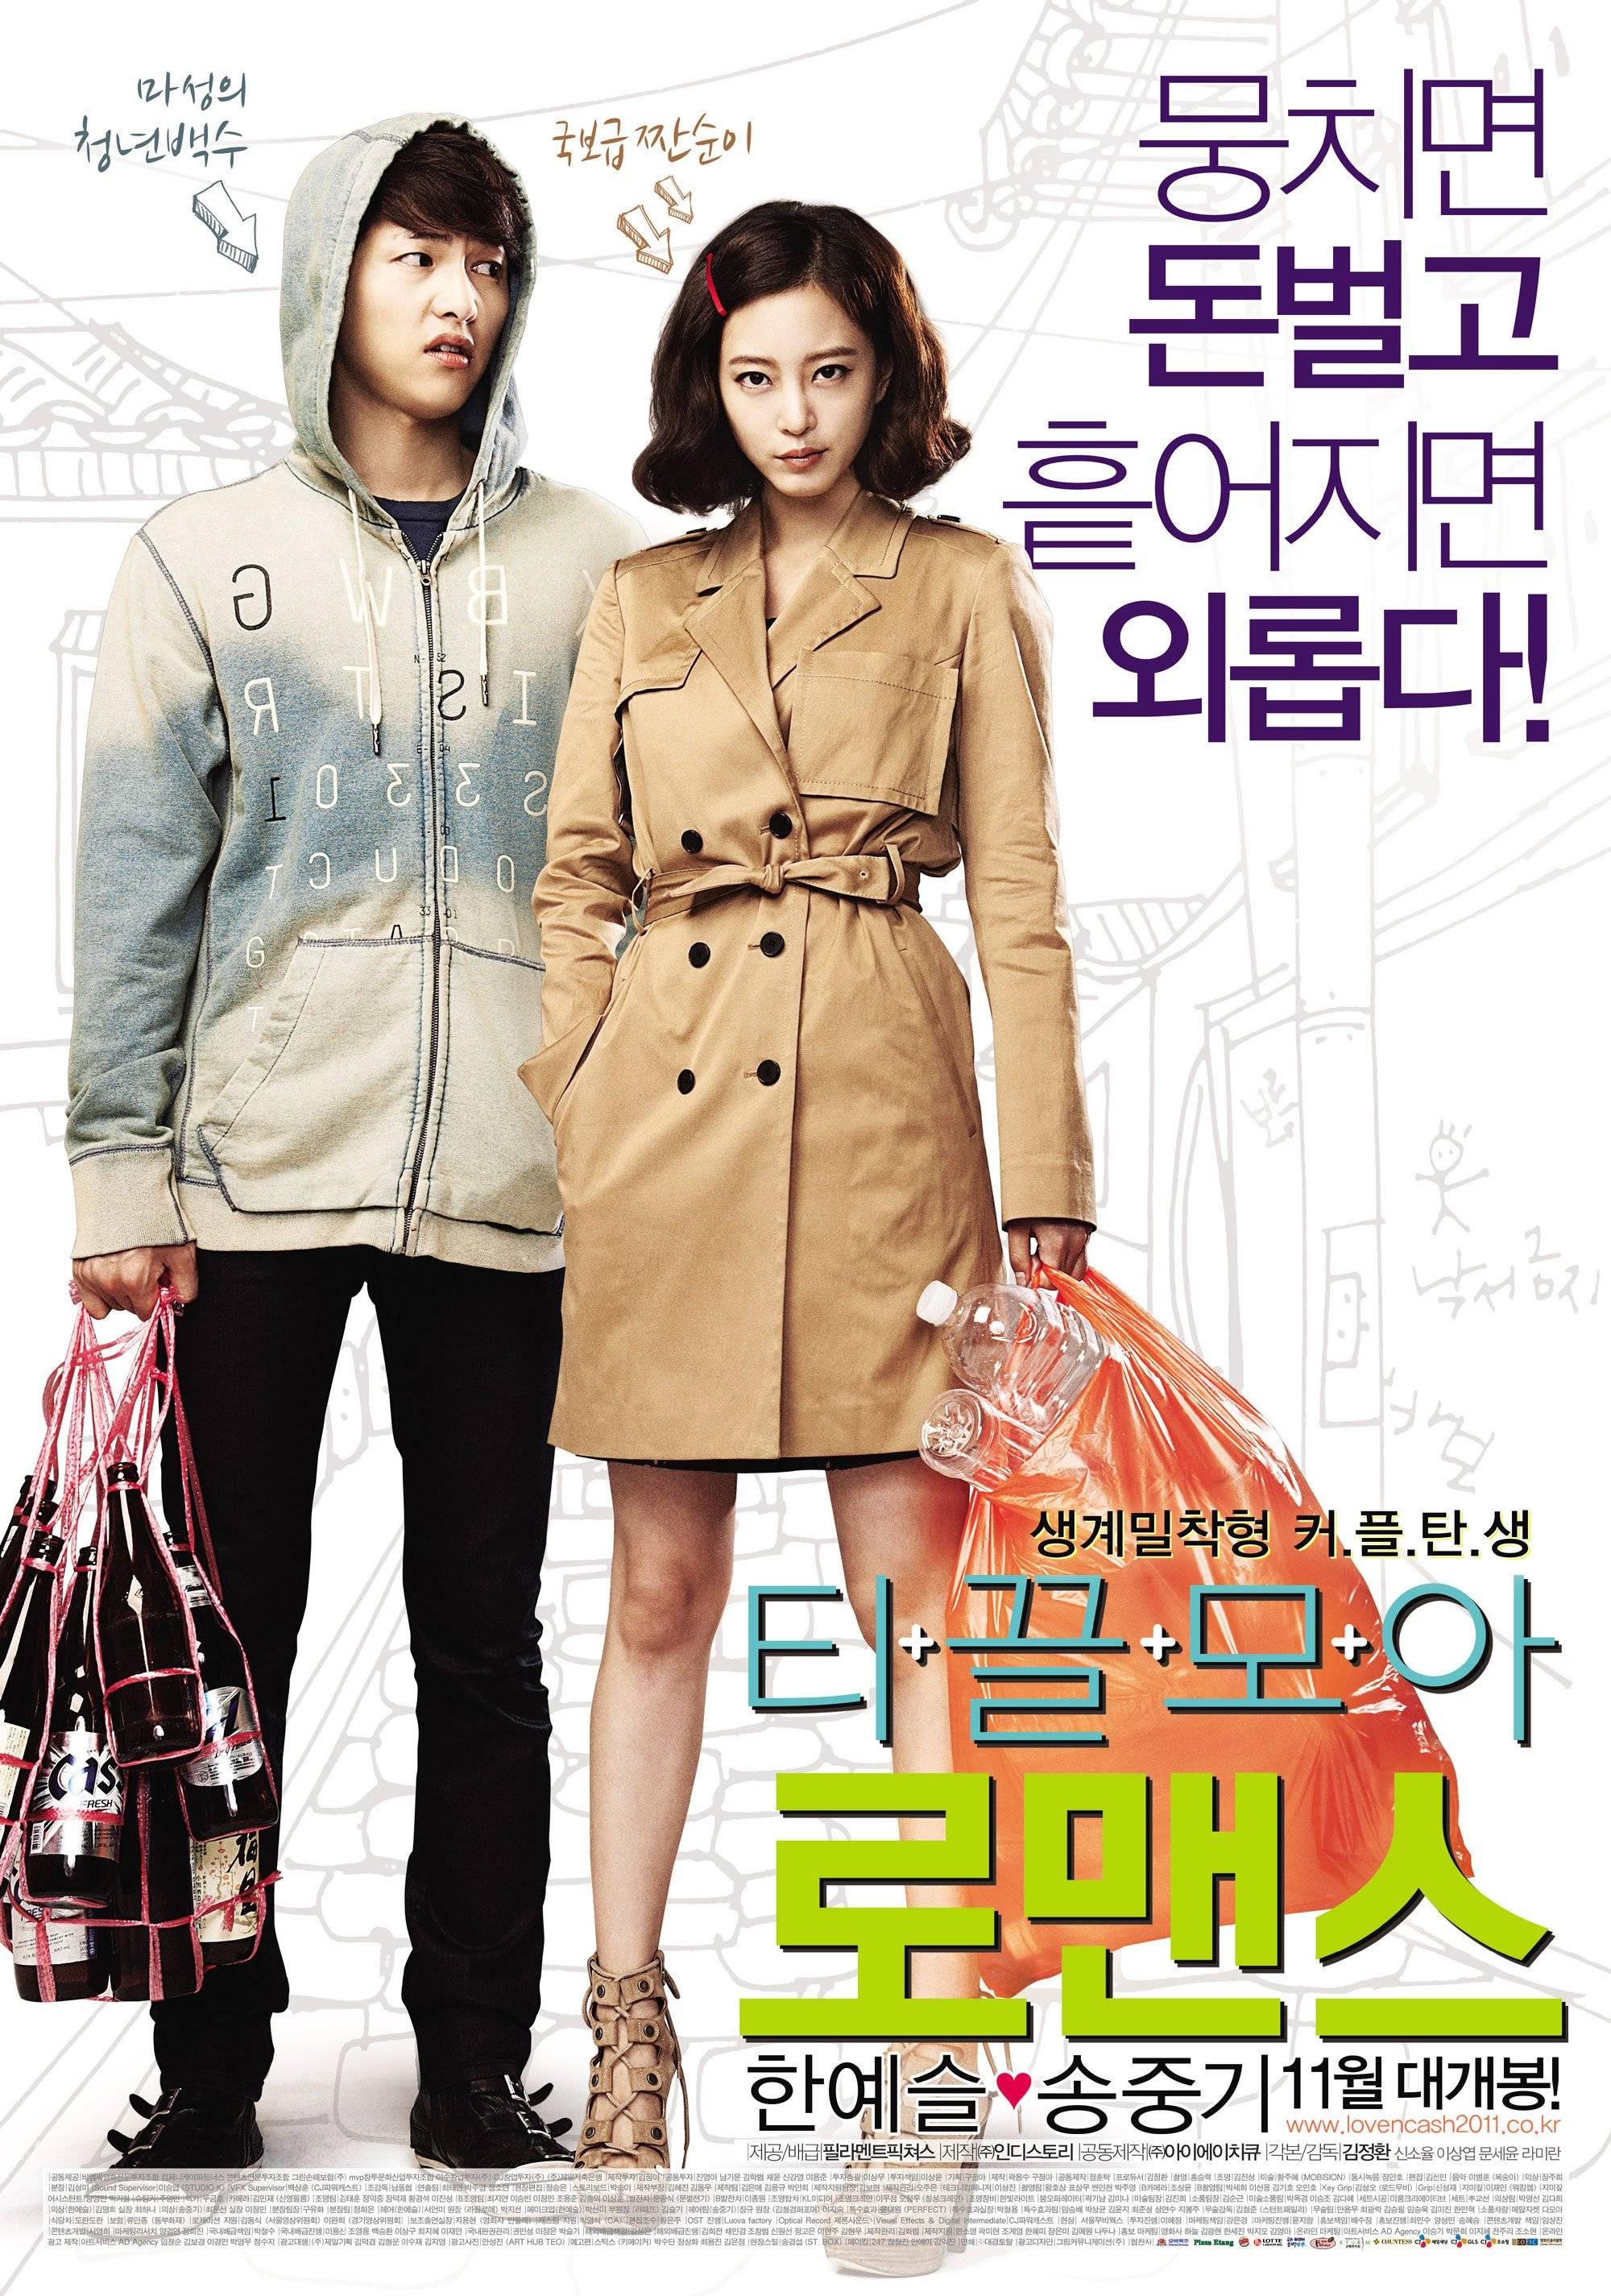 Penny Pinchers (Korean Movie - 2011) - 티끌모아 로맨스